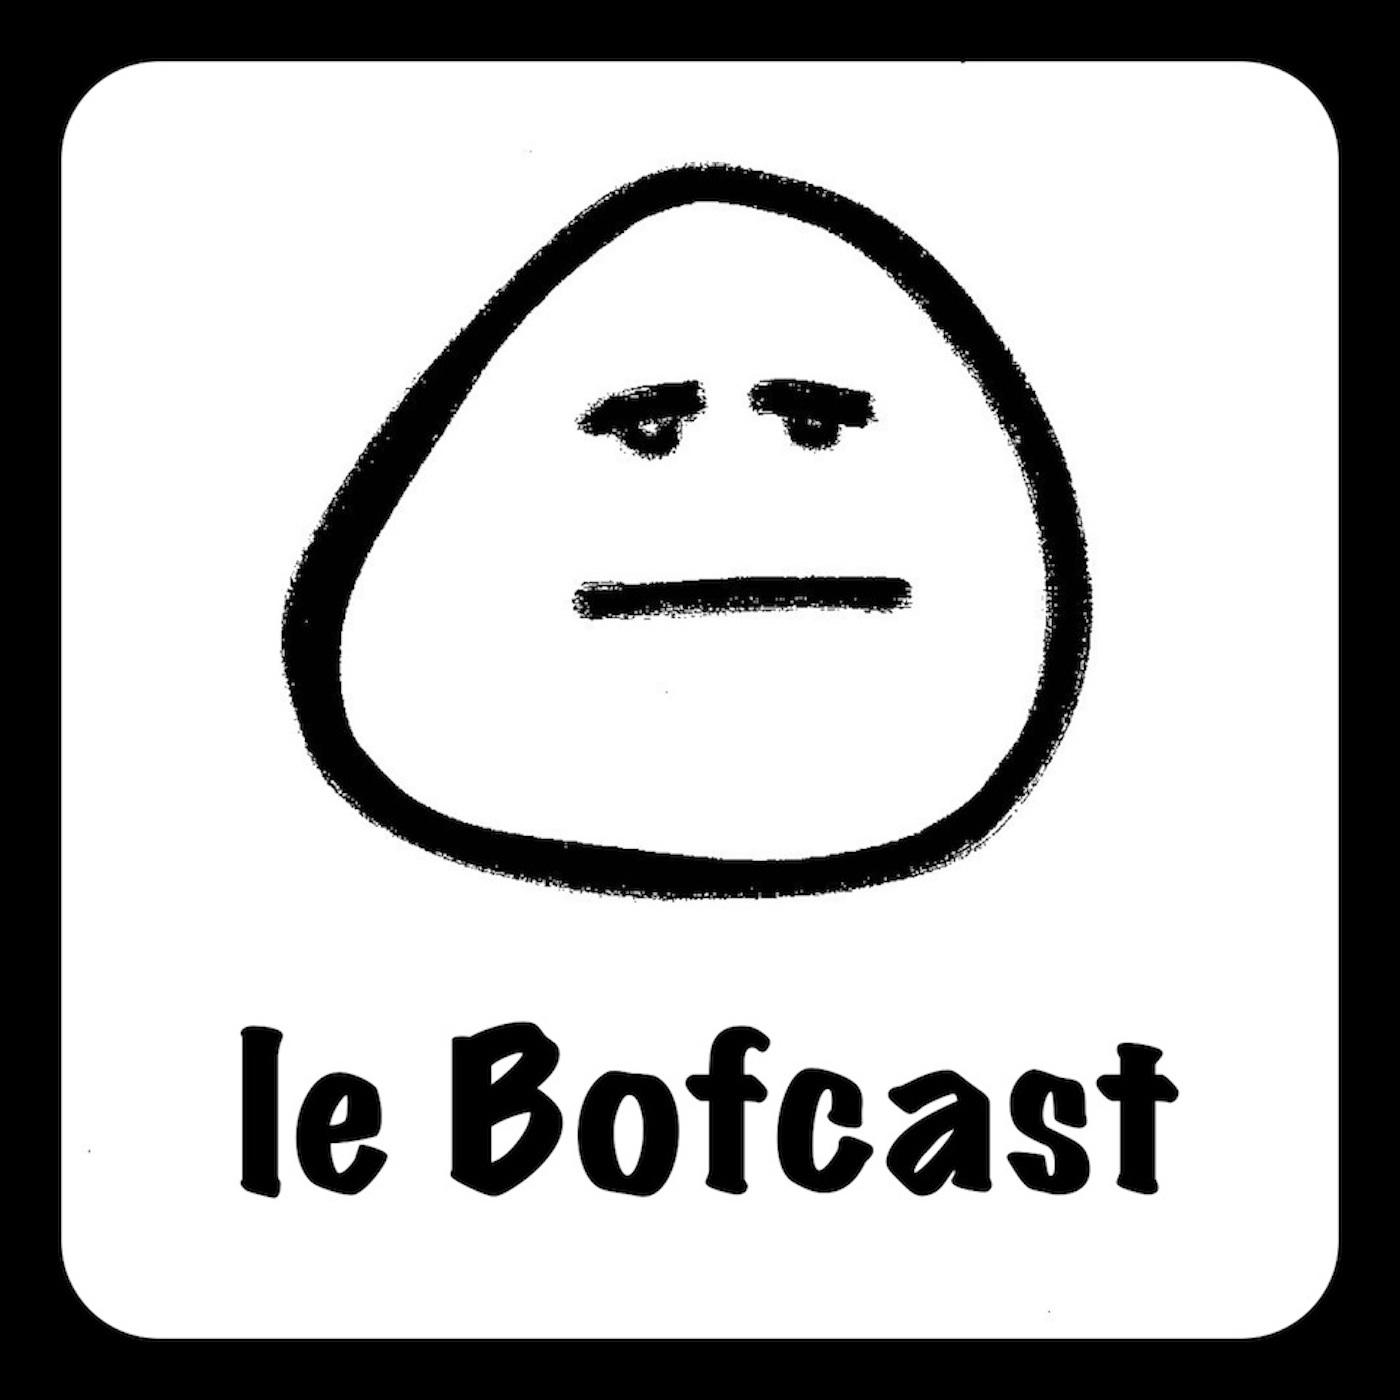 Bofcast